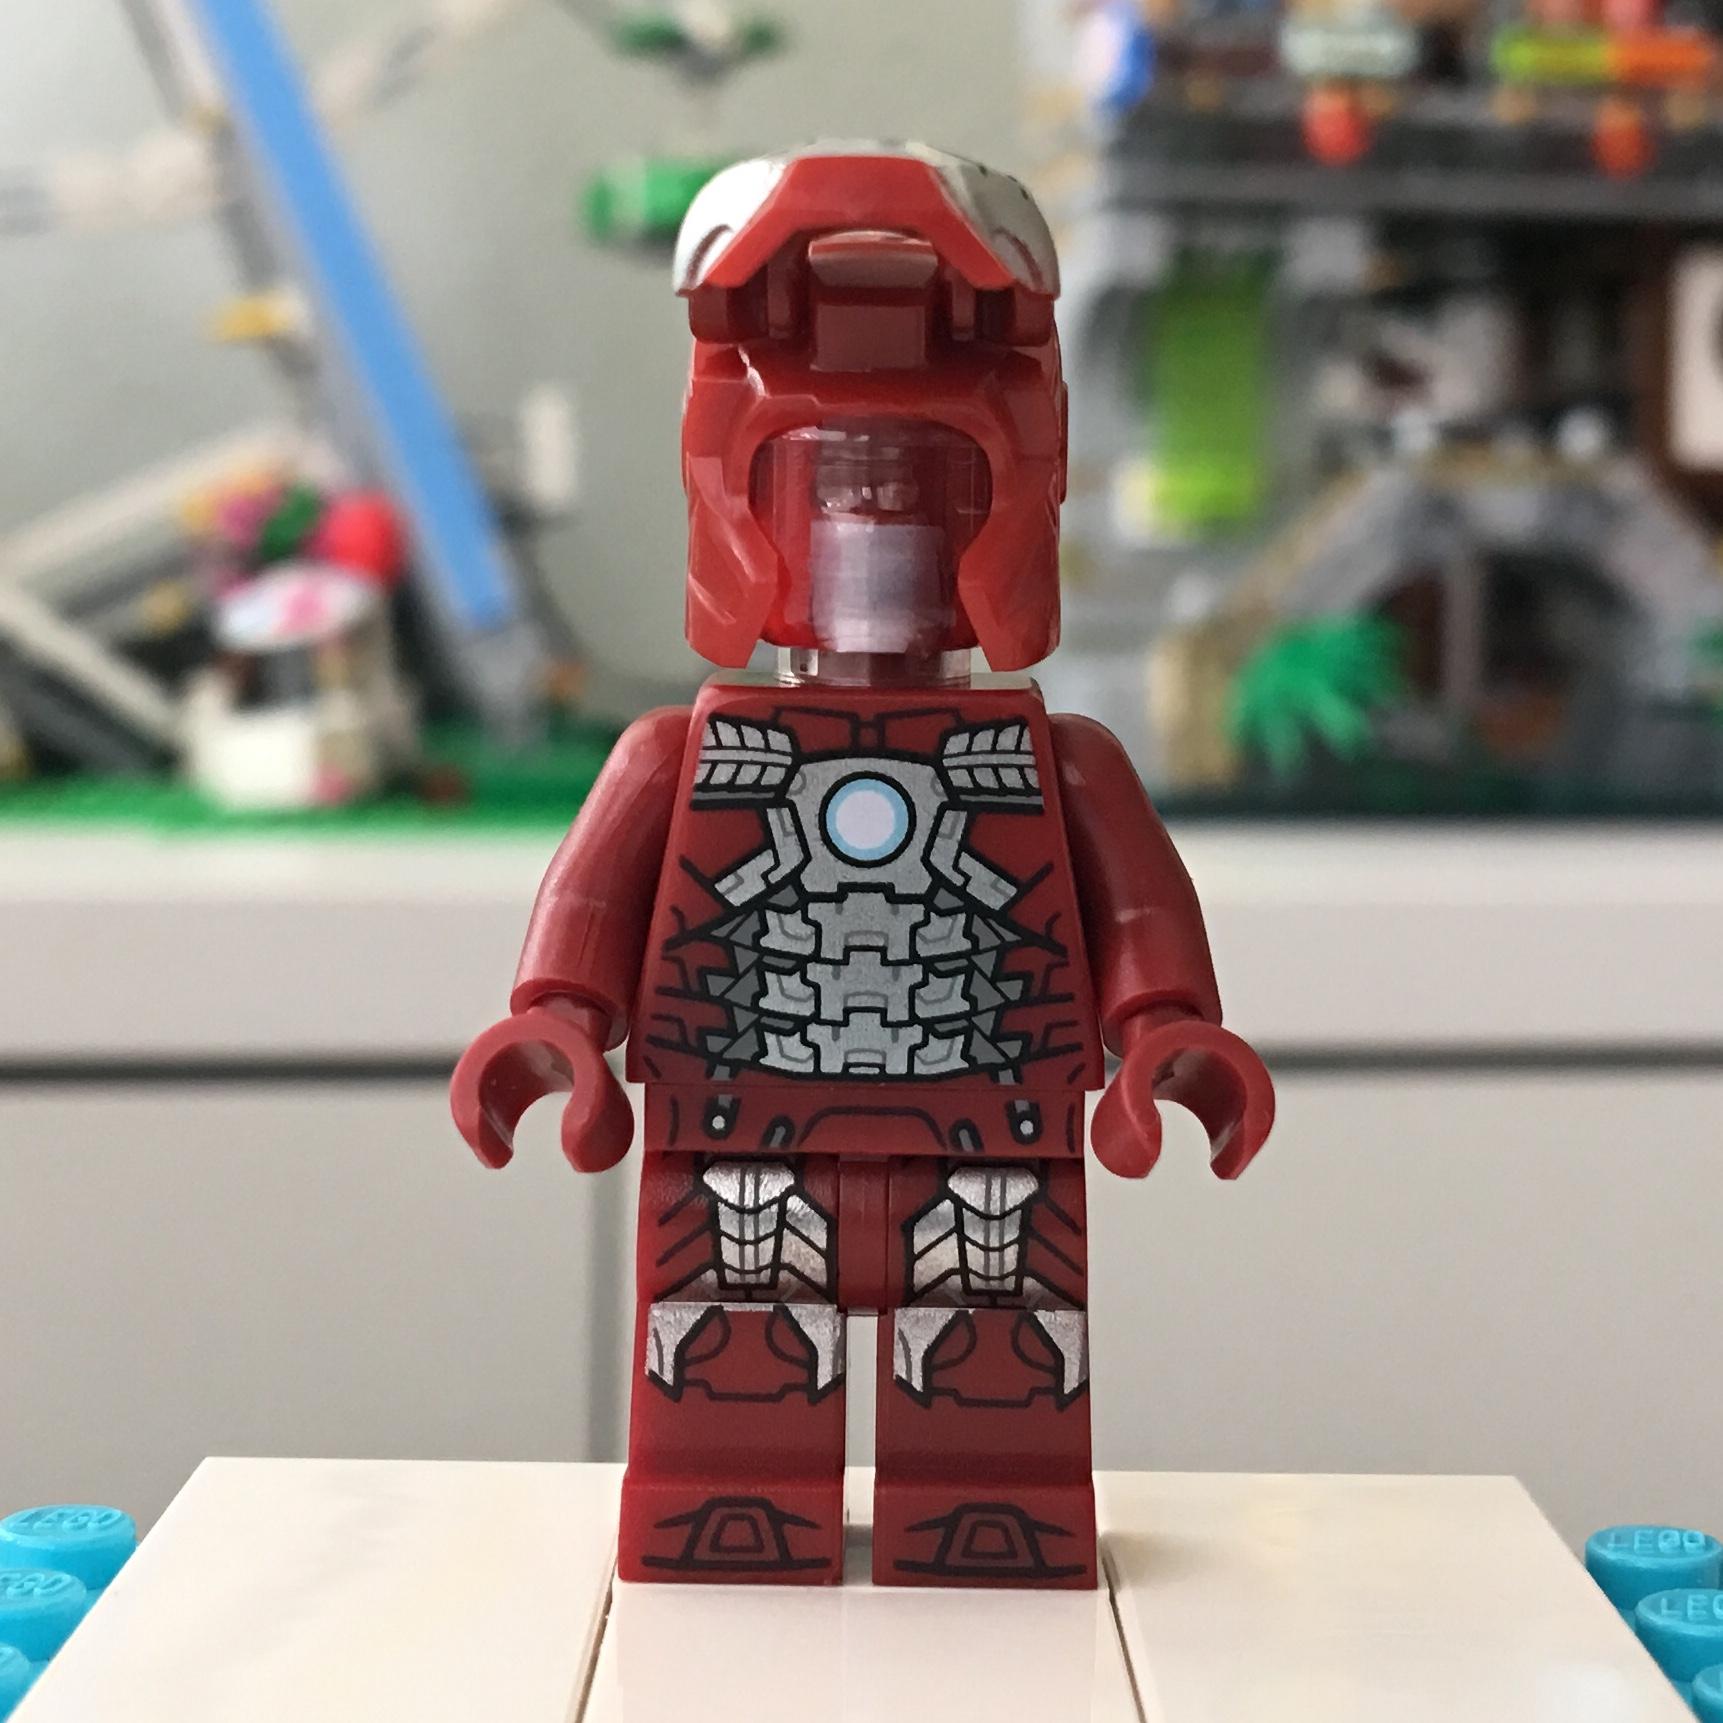 LEGO Plain Red Minifig Space Helmet with Black Visor